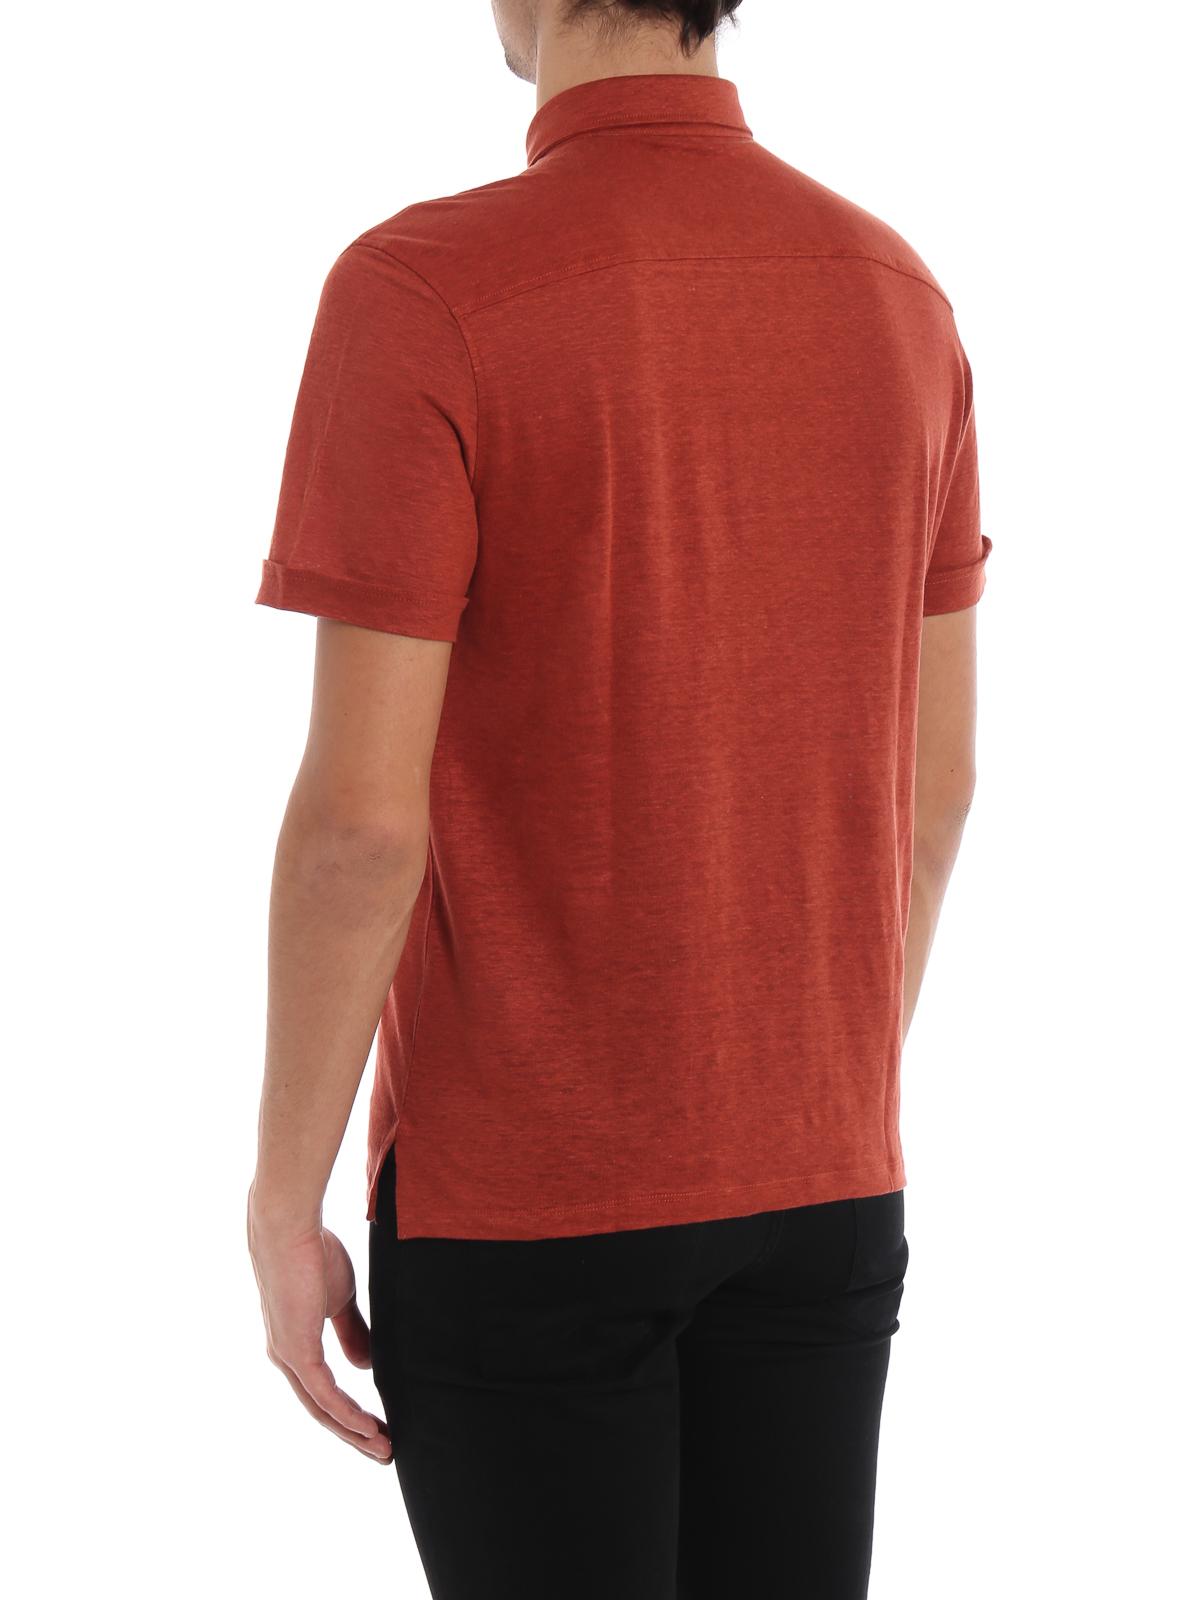 b3385d2f0bdf8 Ermenegildo Zegna - Red linen polo shirt - polo shirts - US564 723 D07